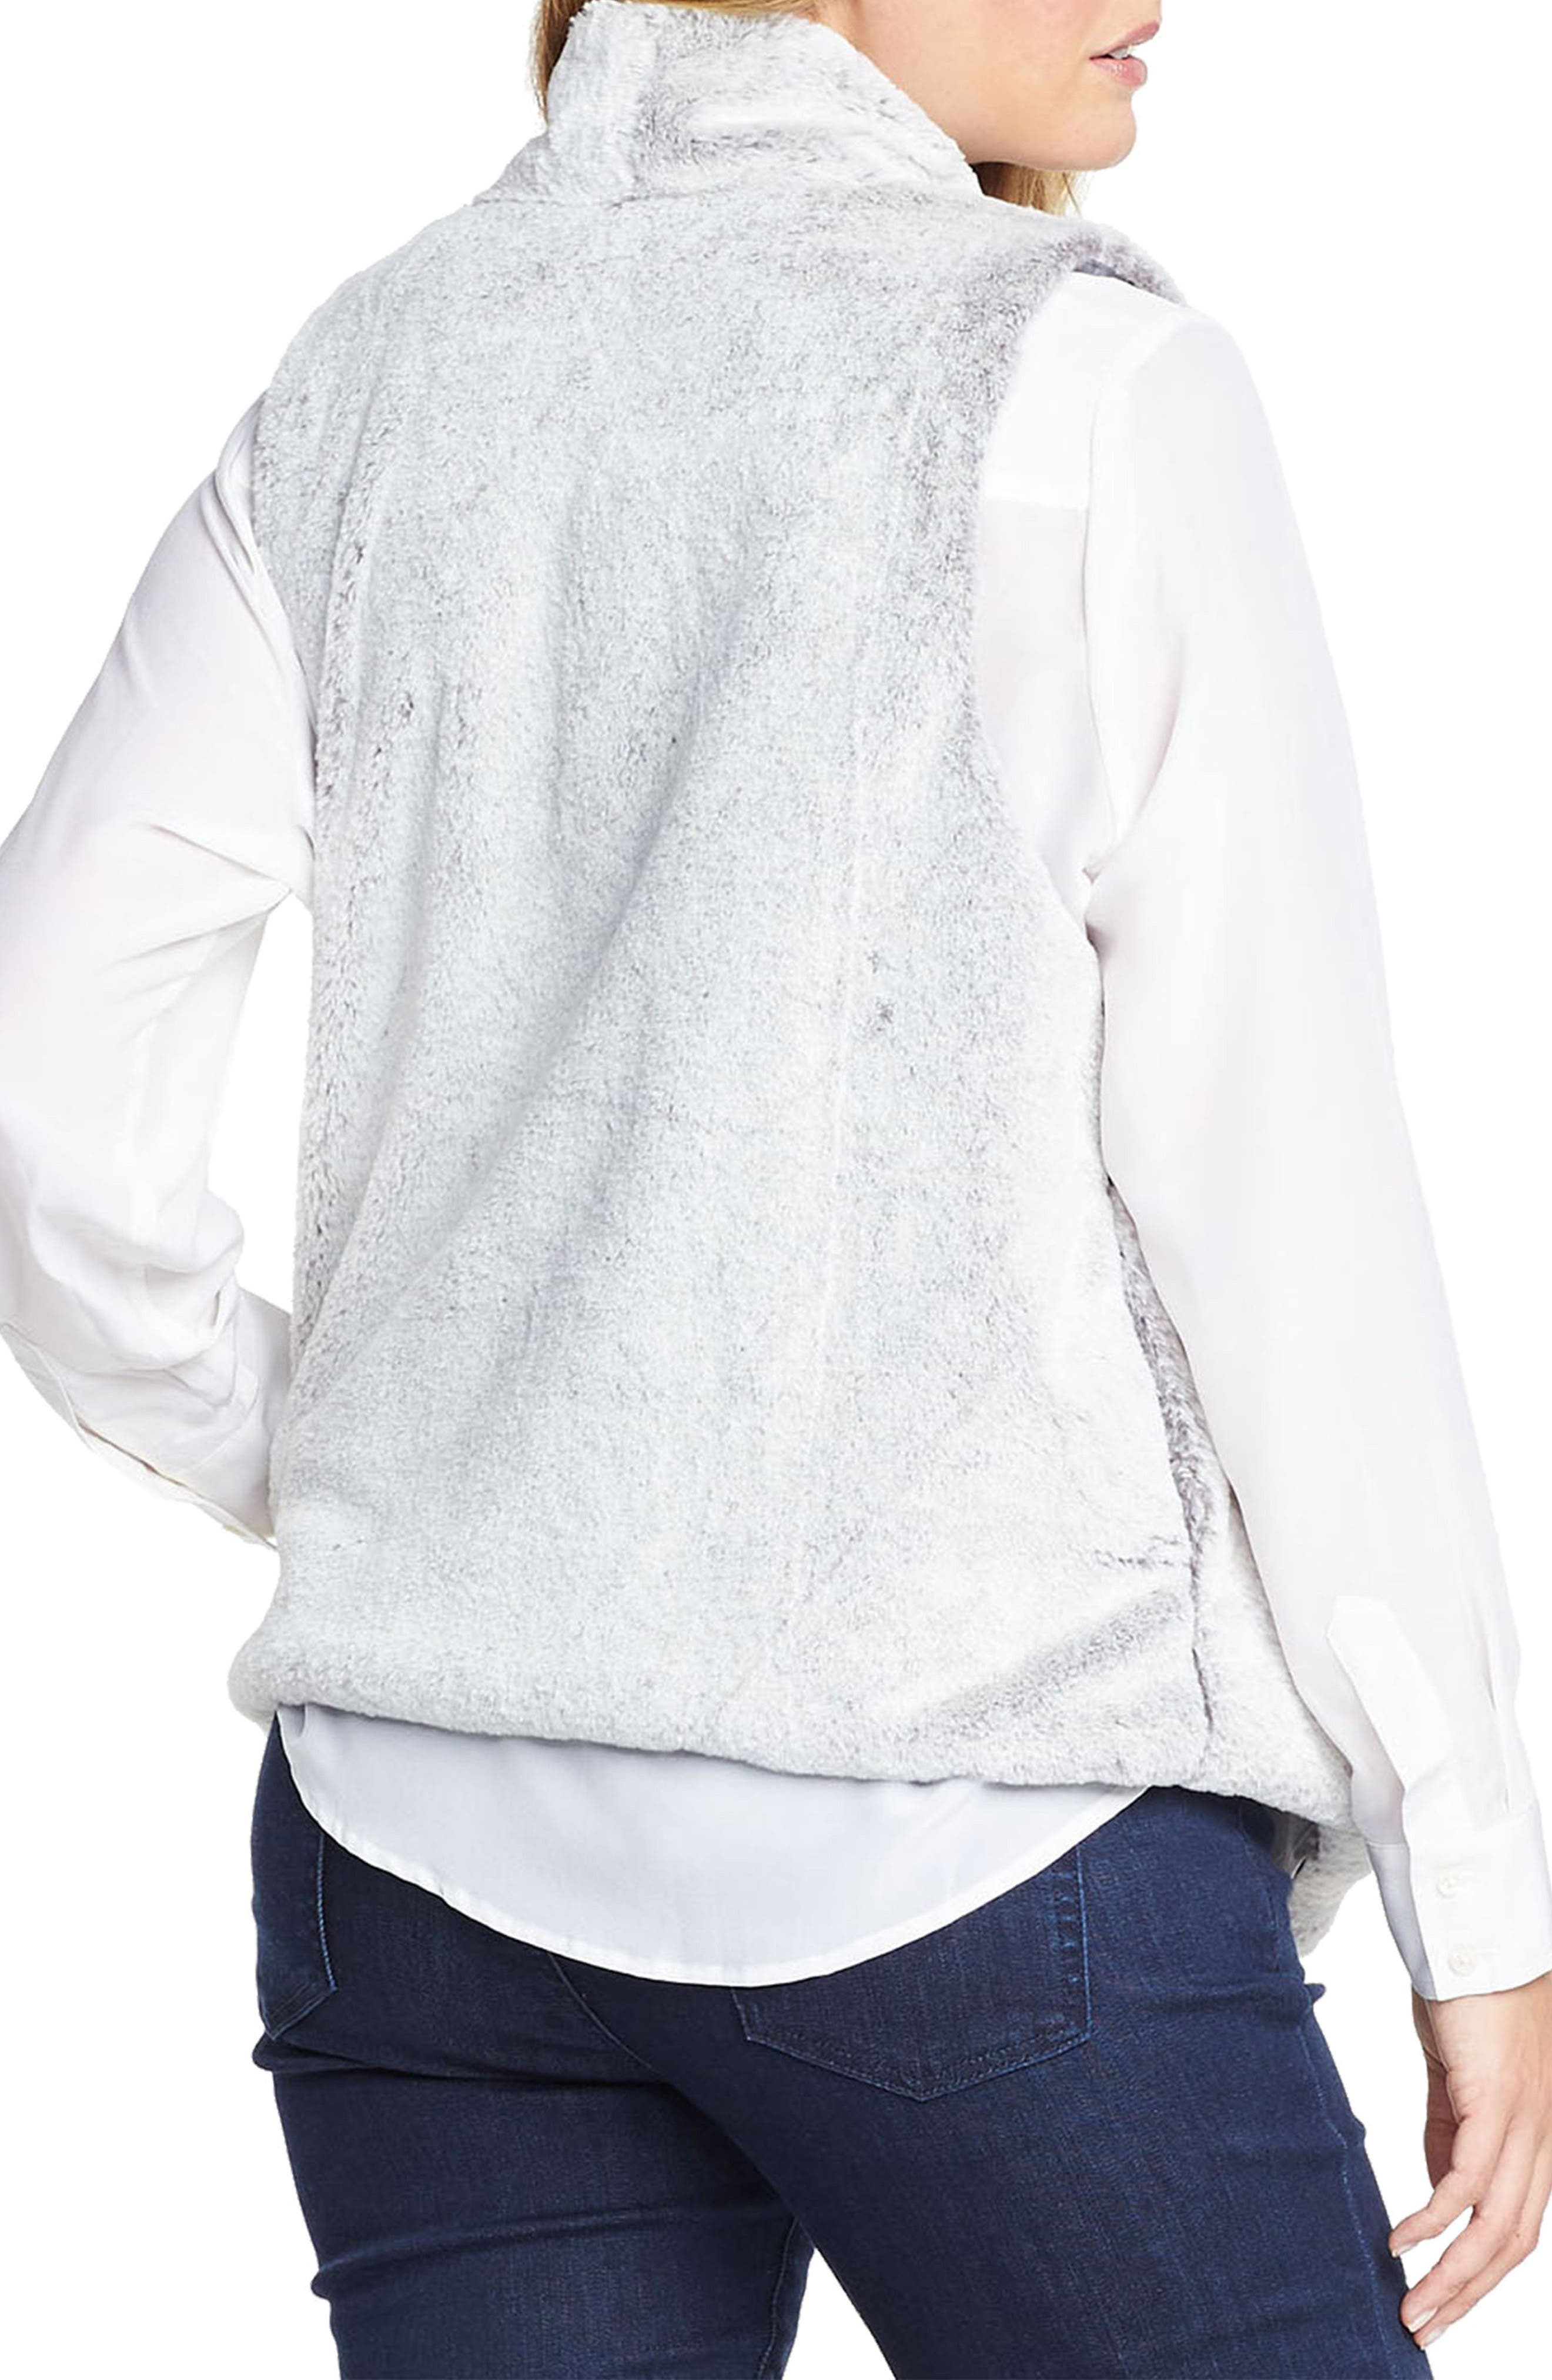 Alternate Image 2  - Tart 'Kya' Faux Fur Vest (Plus Size)